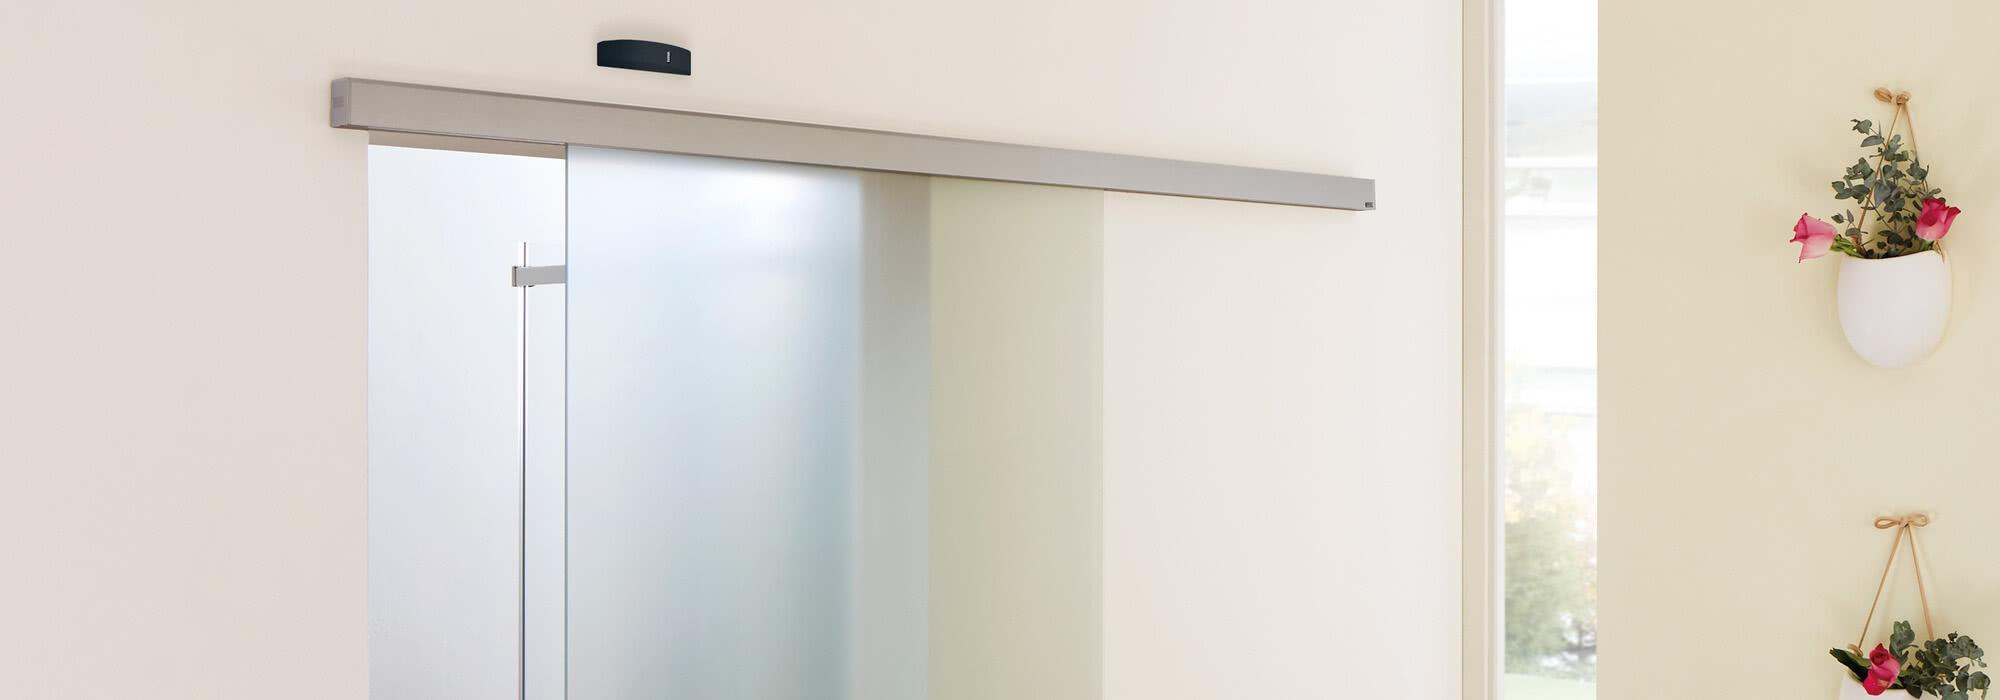 SPRINZ Kopfgrafik Seniorendomizil Schiebetuer Motion700Automatik offen.jpg